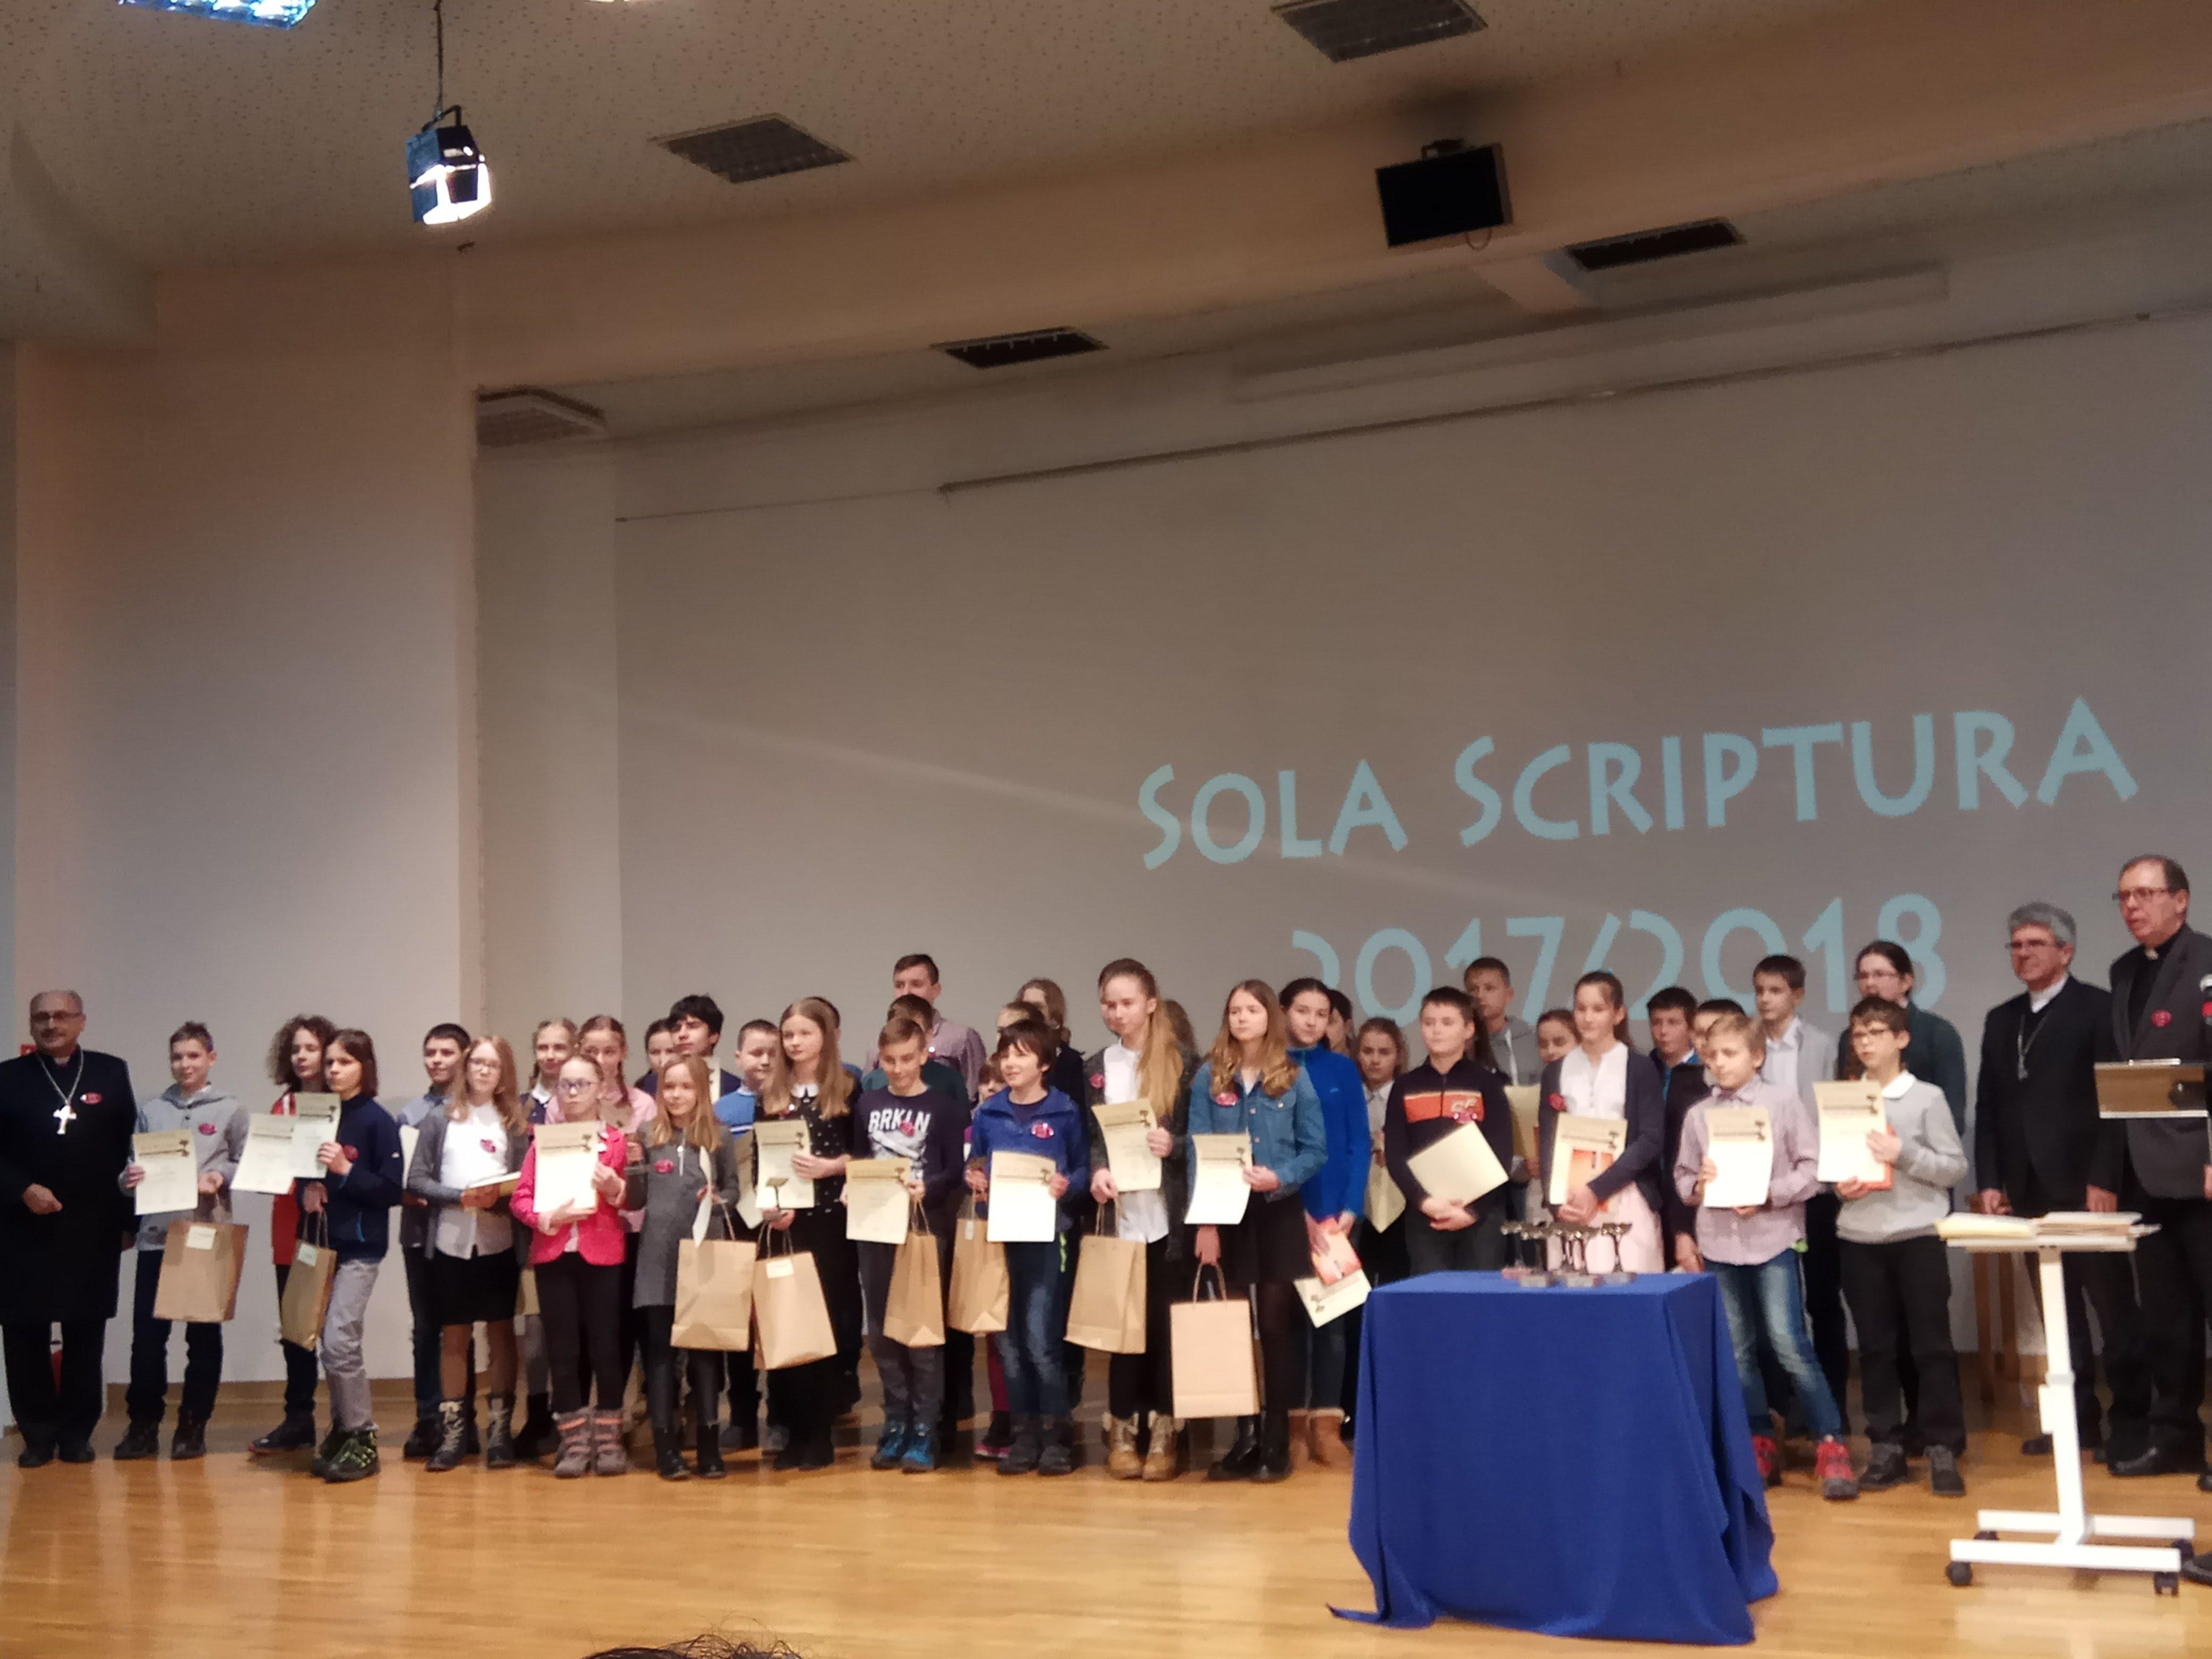 Finał Ogólnopolskiego Konkursu SOLA SCRIPTURA